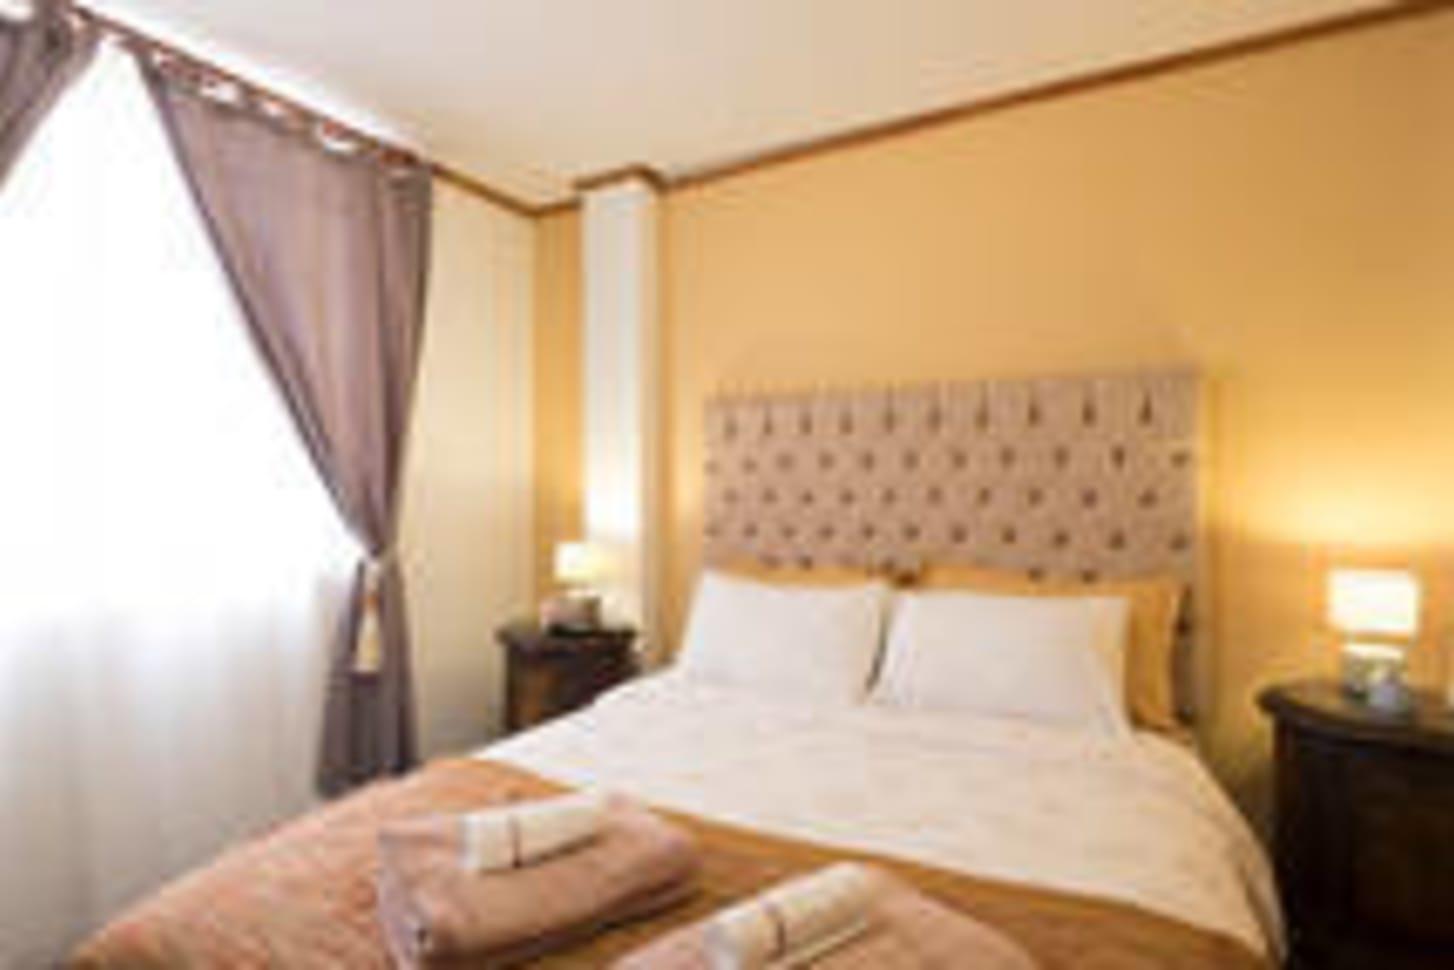 Lima Bedroom Furniture Luxury Apartment Lima Gay Santiago De Surco Bed Breakfast To